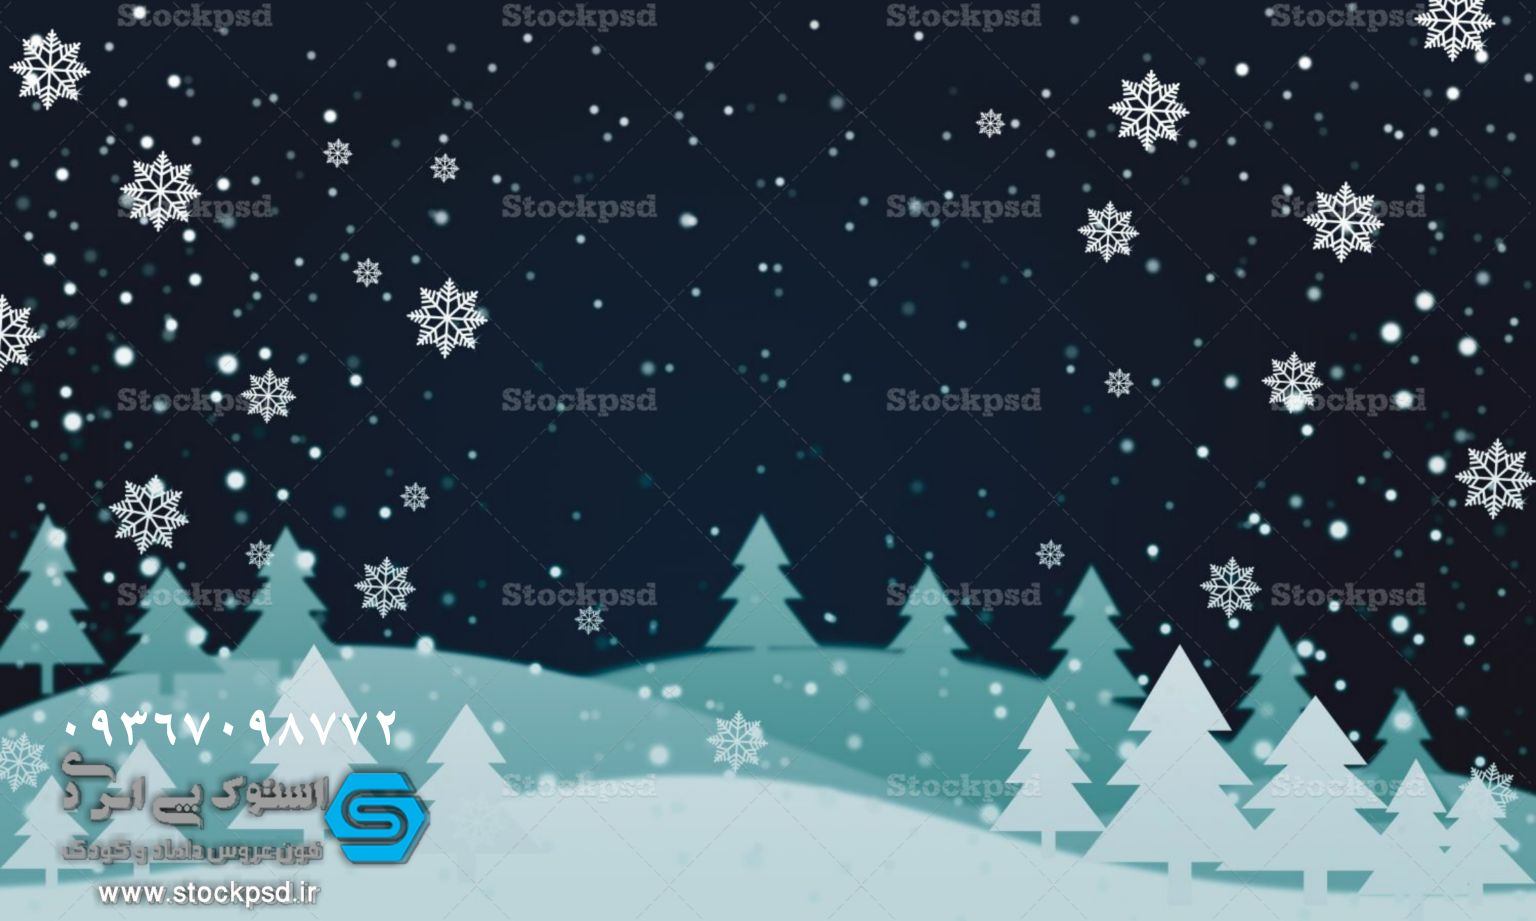 بک گراند زمستان عکاسی